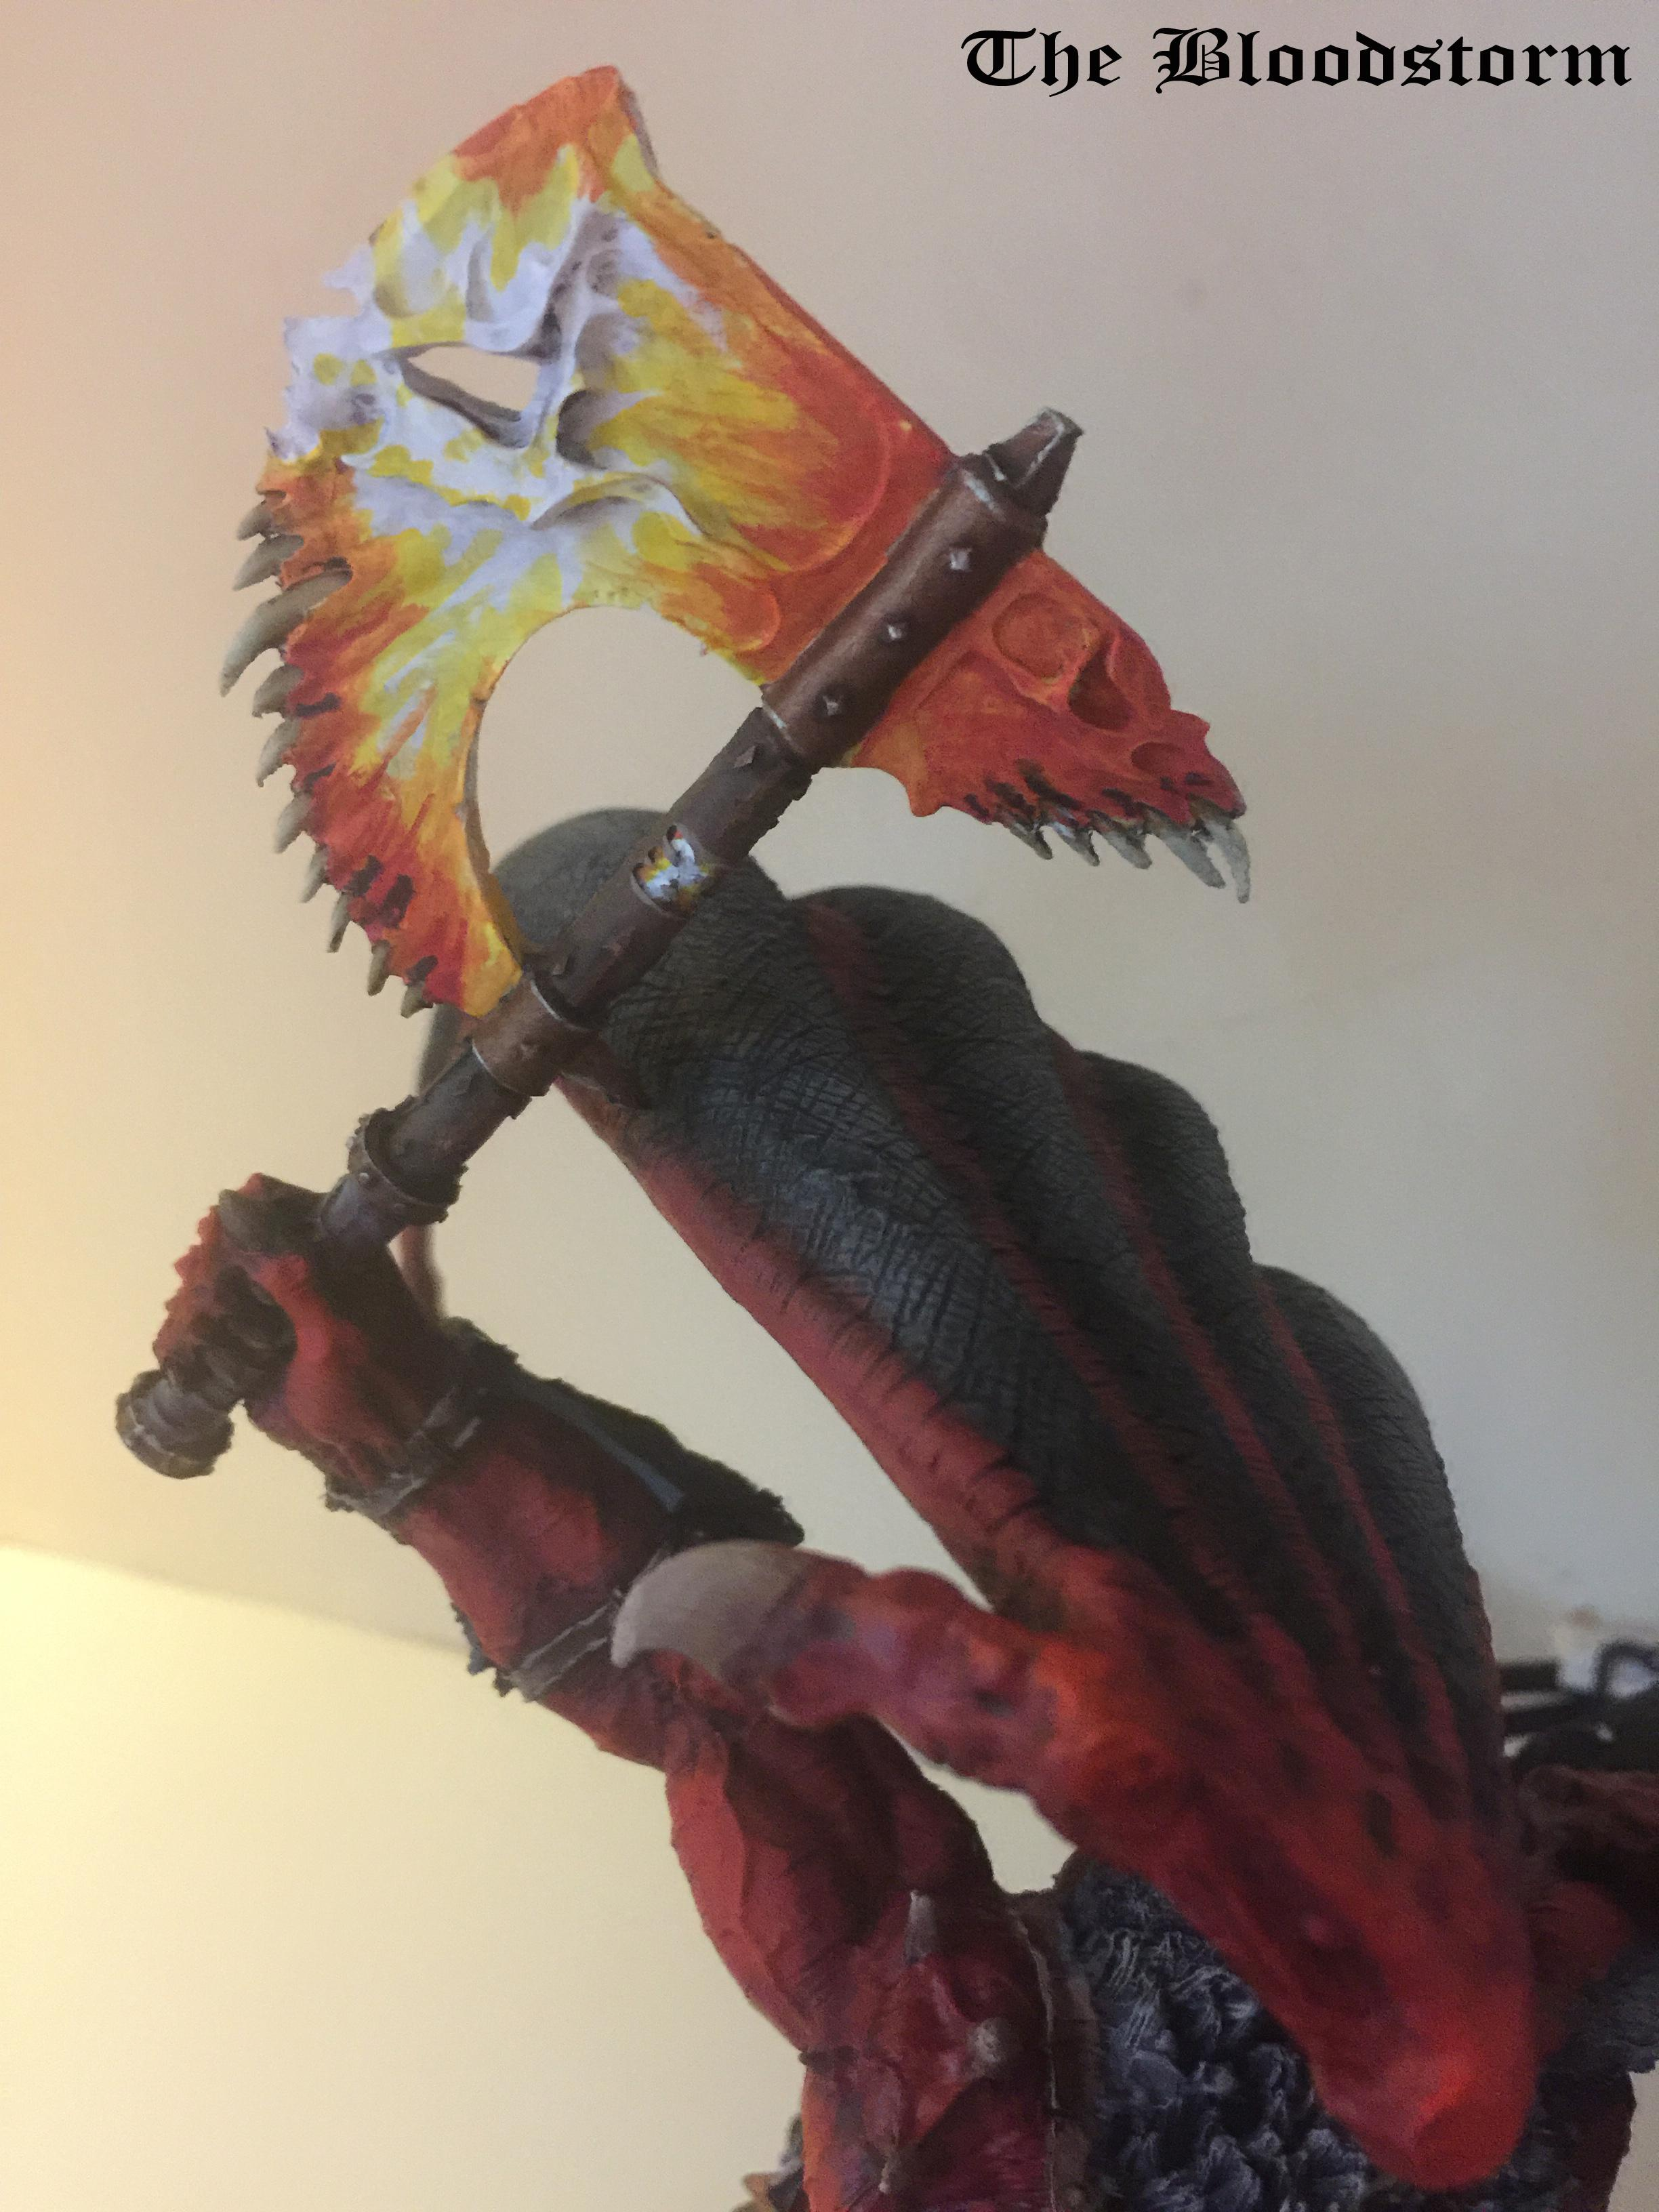 An'ggrath, Bloodthirster, Chaos Daemons, Conversion, Daemon Lord, Forge World, Gargantuan Creature, Greater Daemon, Khorne, Warhammer 40,000